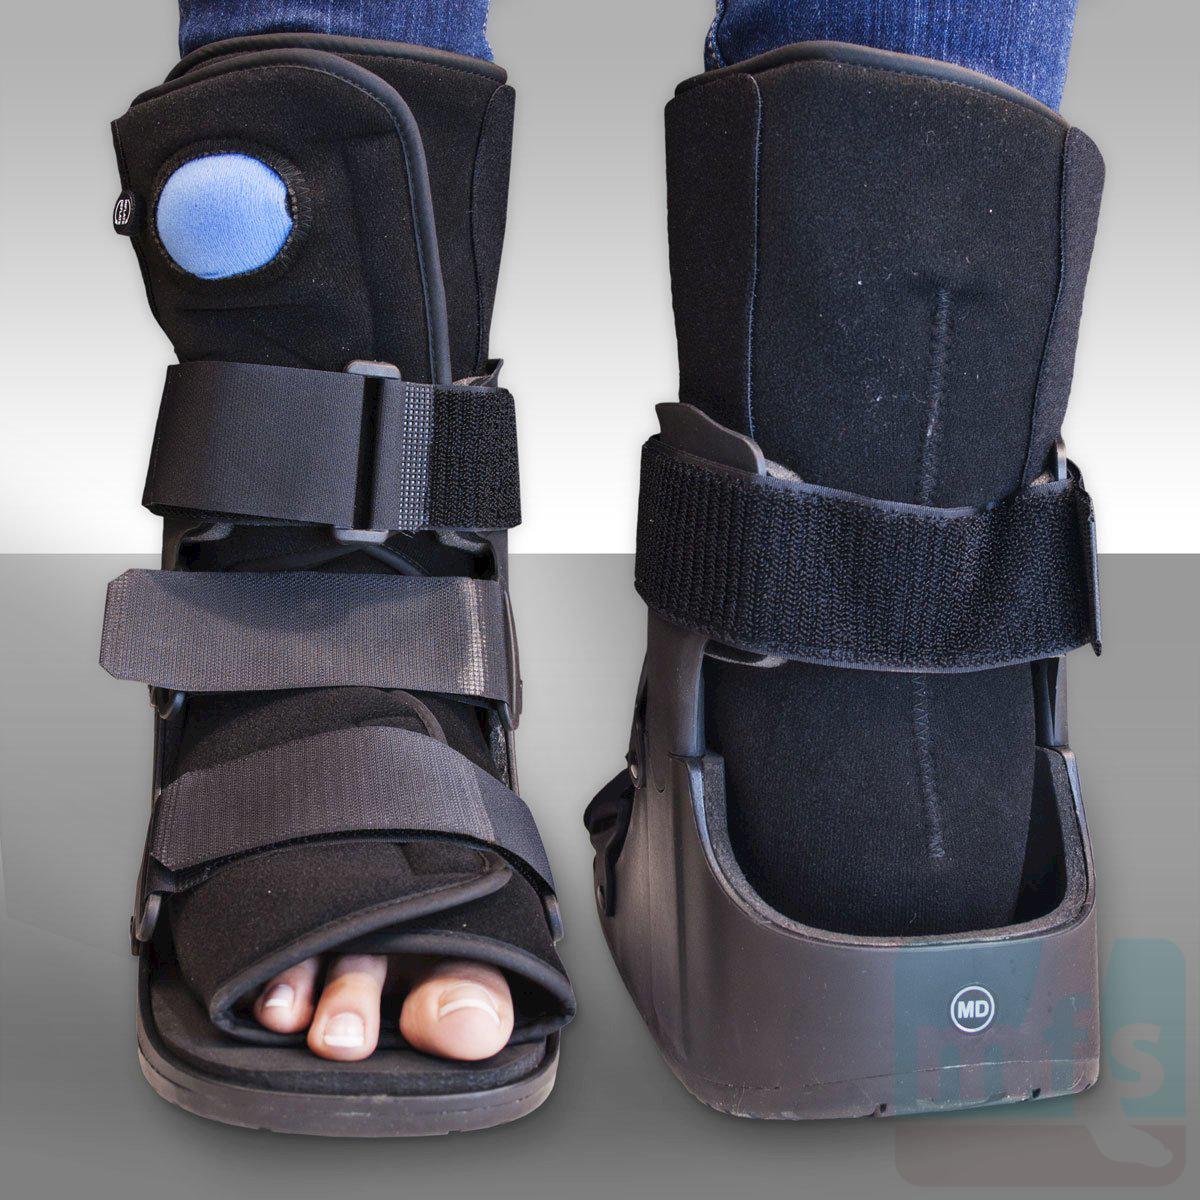 Low Top Pneumatic Walking Cast Myfootshop Com